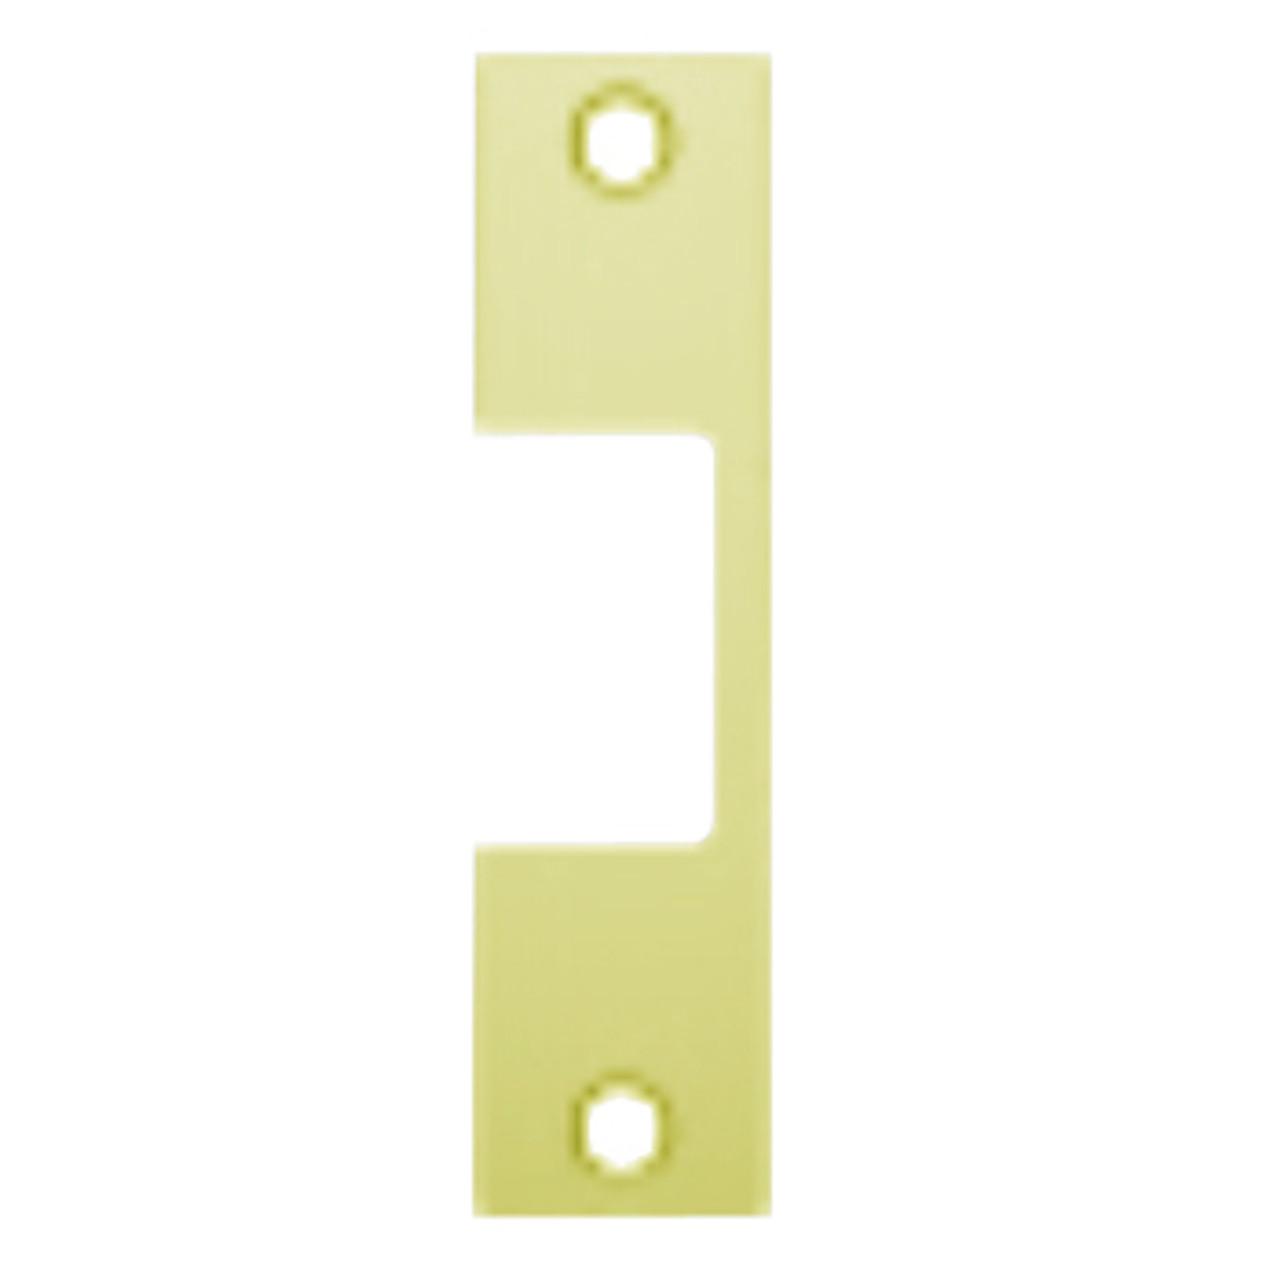 "E-605 Hes 4-7/8"" x 1-1/4"" Faceplate in Bright Brass Finish"